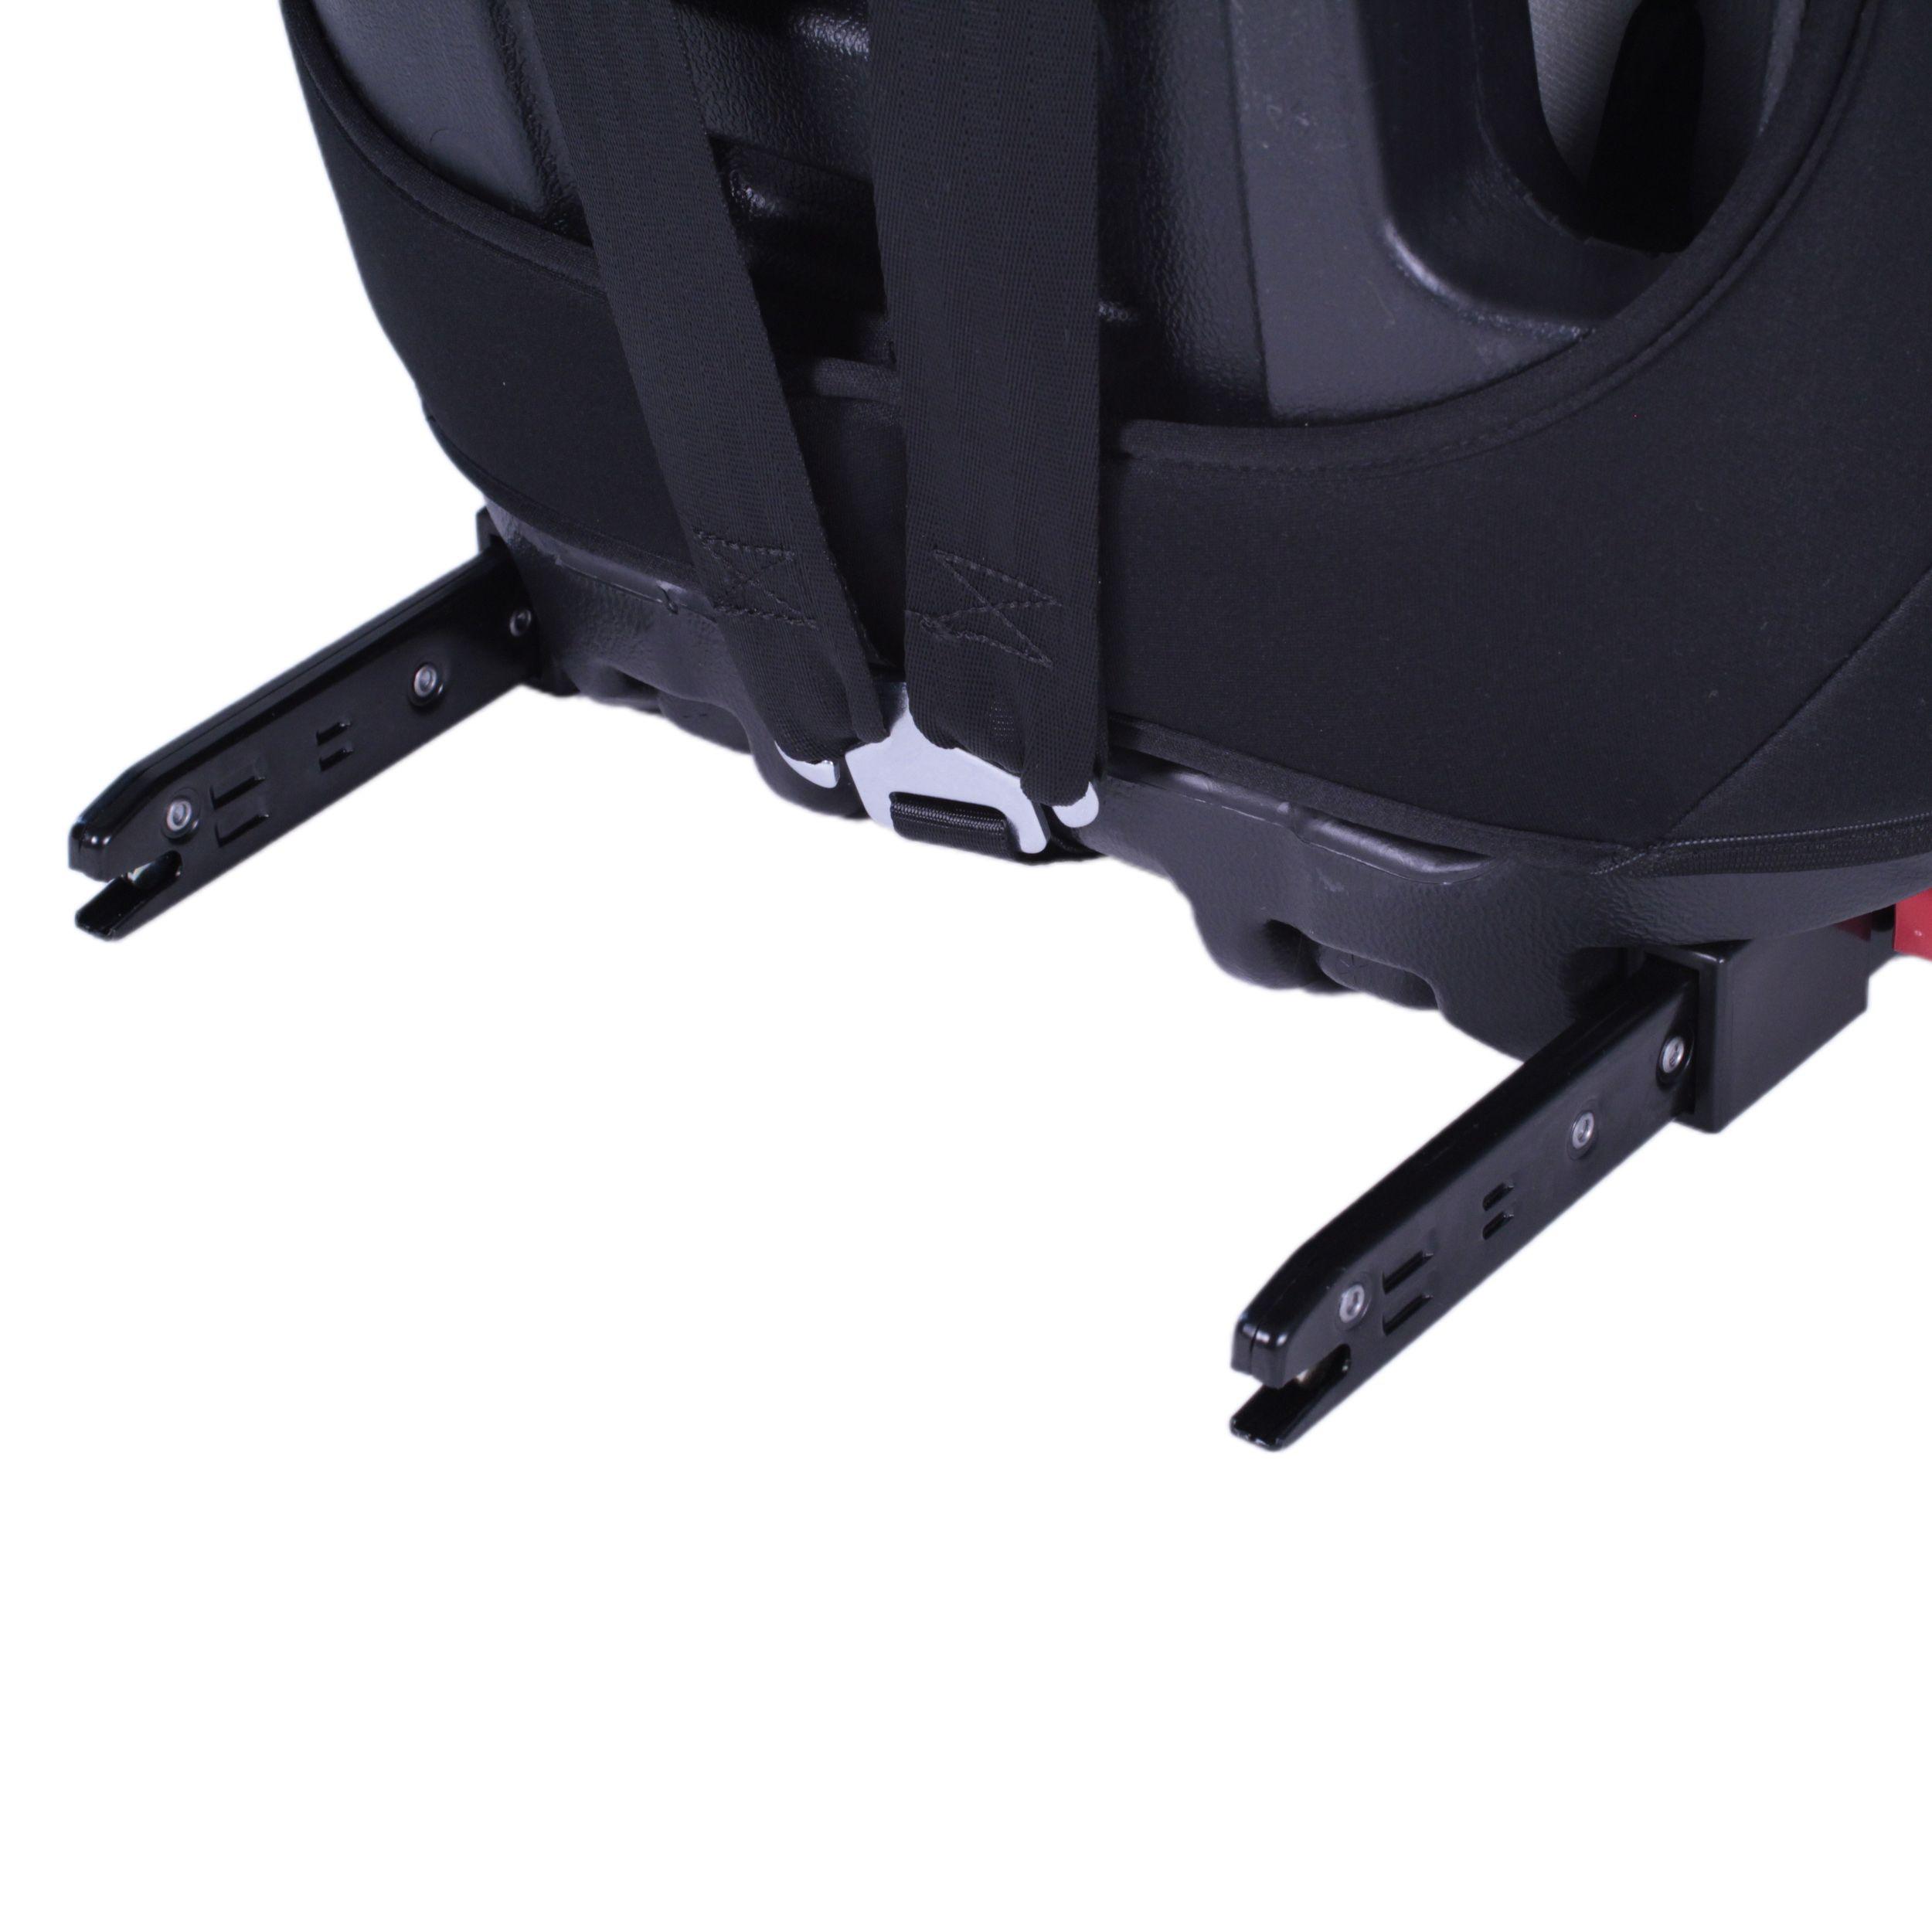 Silla De Auto Isofix Baby Way Gris Bw-750G21